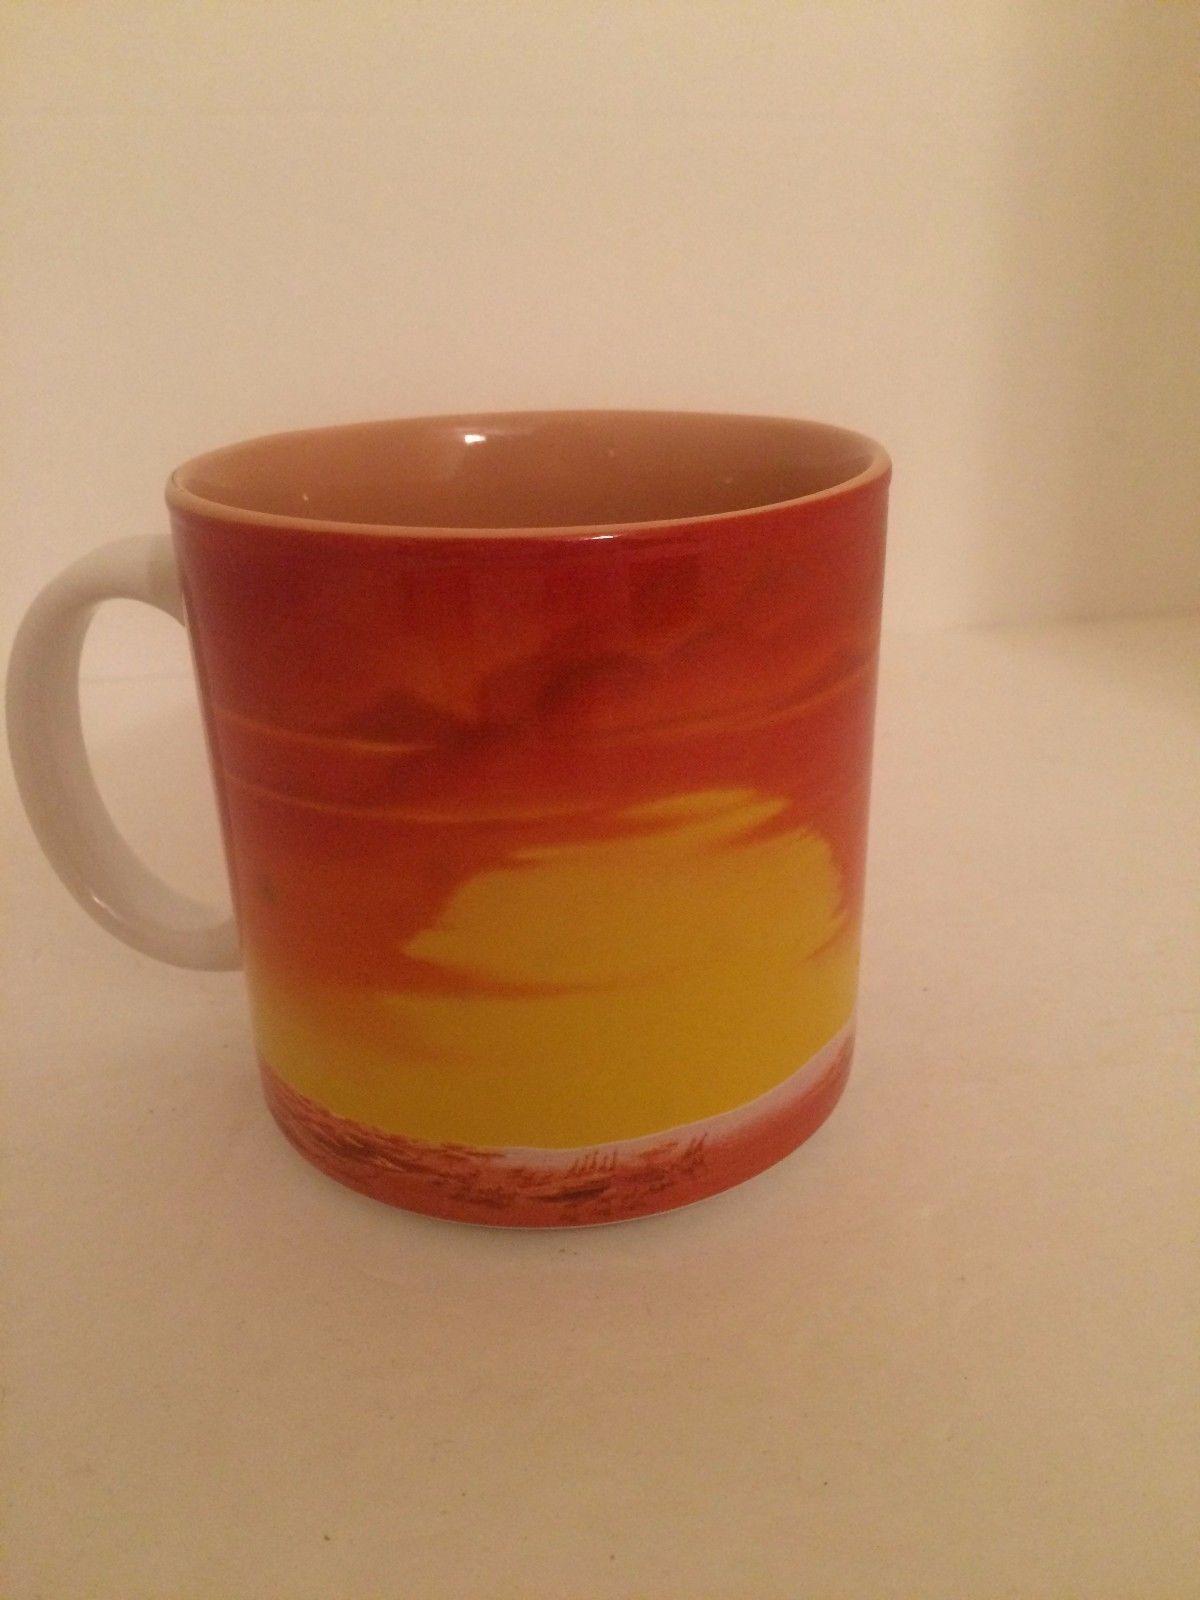 Mug Store King Lion Cup And Disney Simba Items Similar Coffee D9IYEH2W